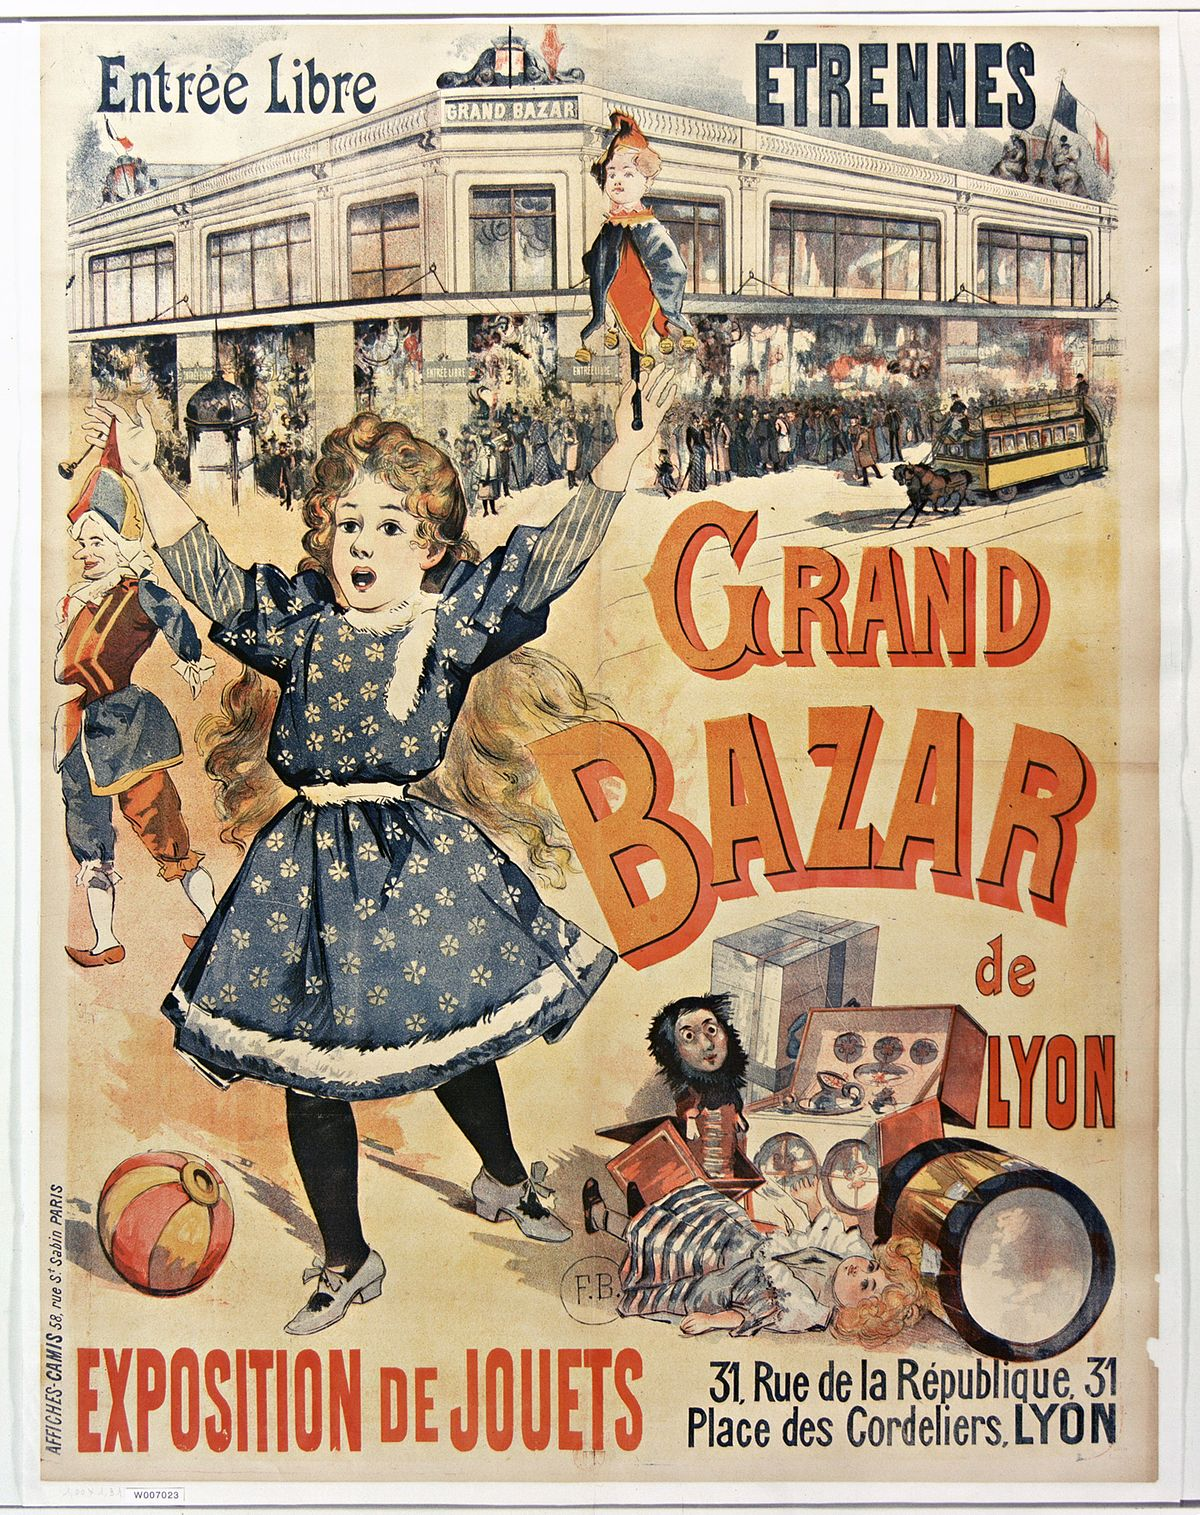 Grand Bazar de Lyon (affiche) 1892.jpg